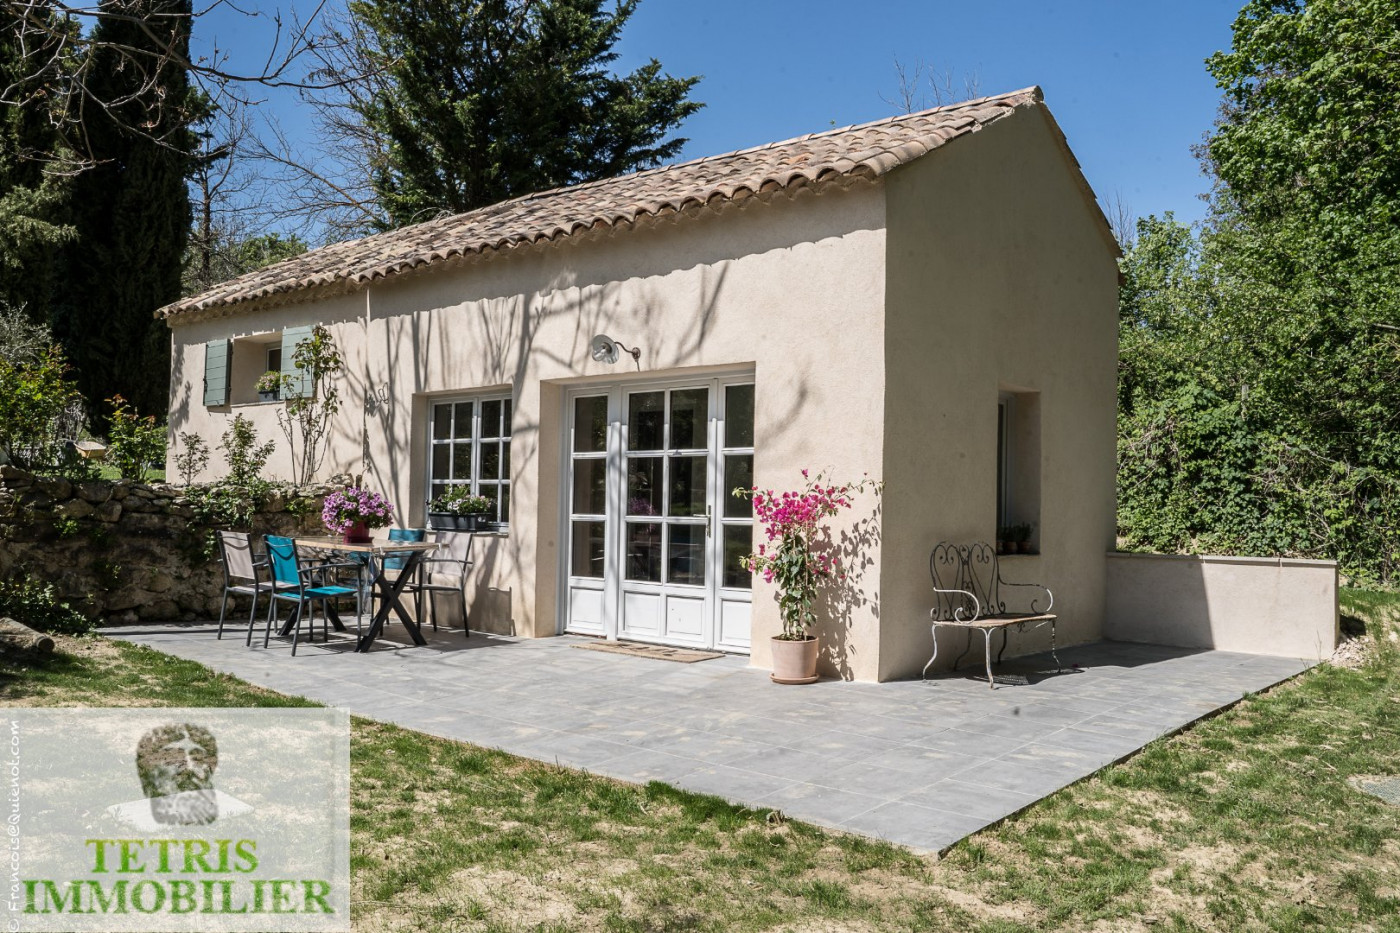 A vendre  Cadenet | Réf 840135229 - Tetris immobilier